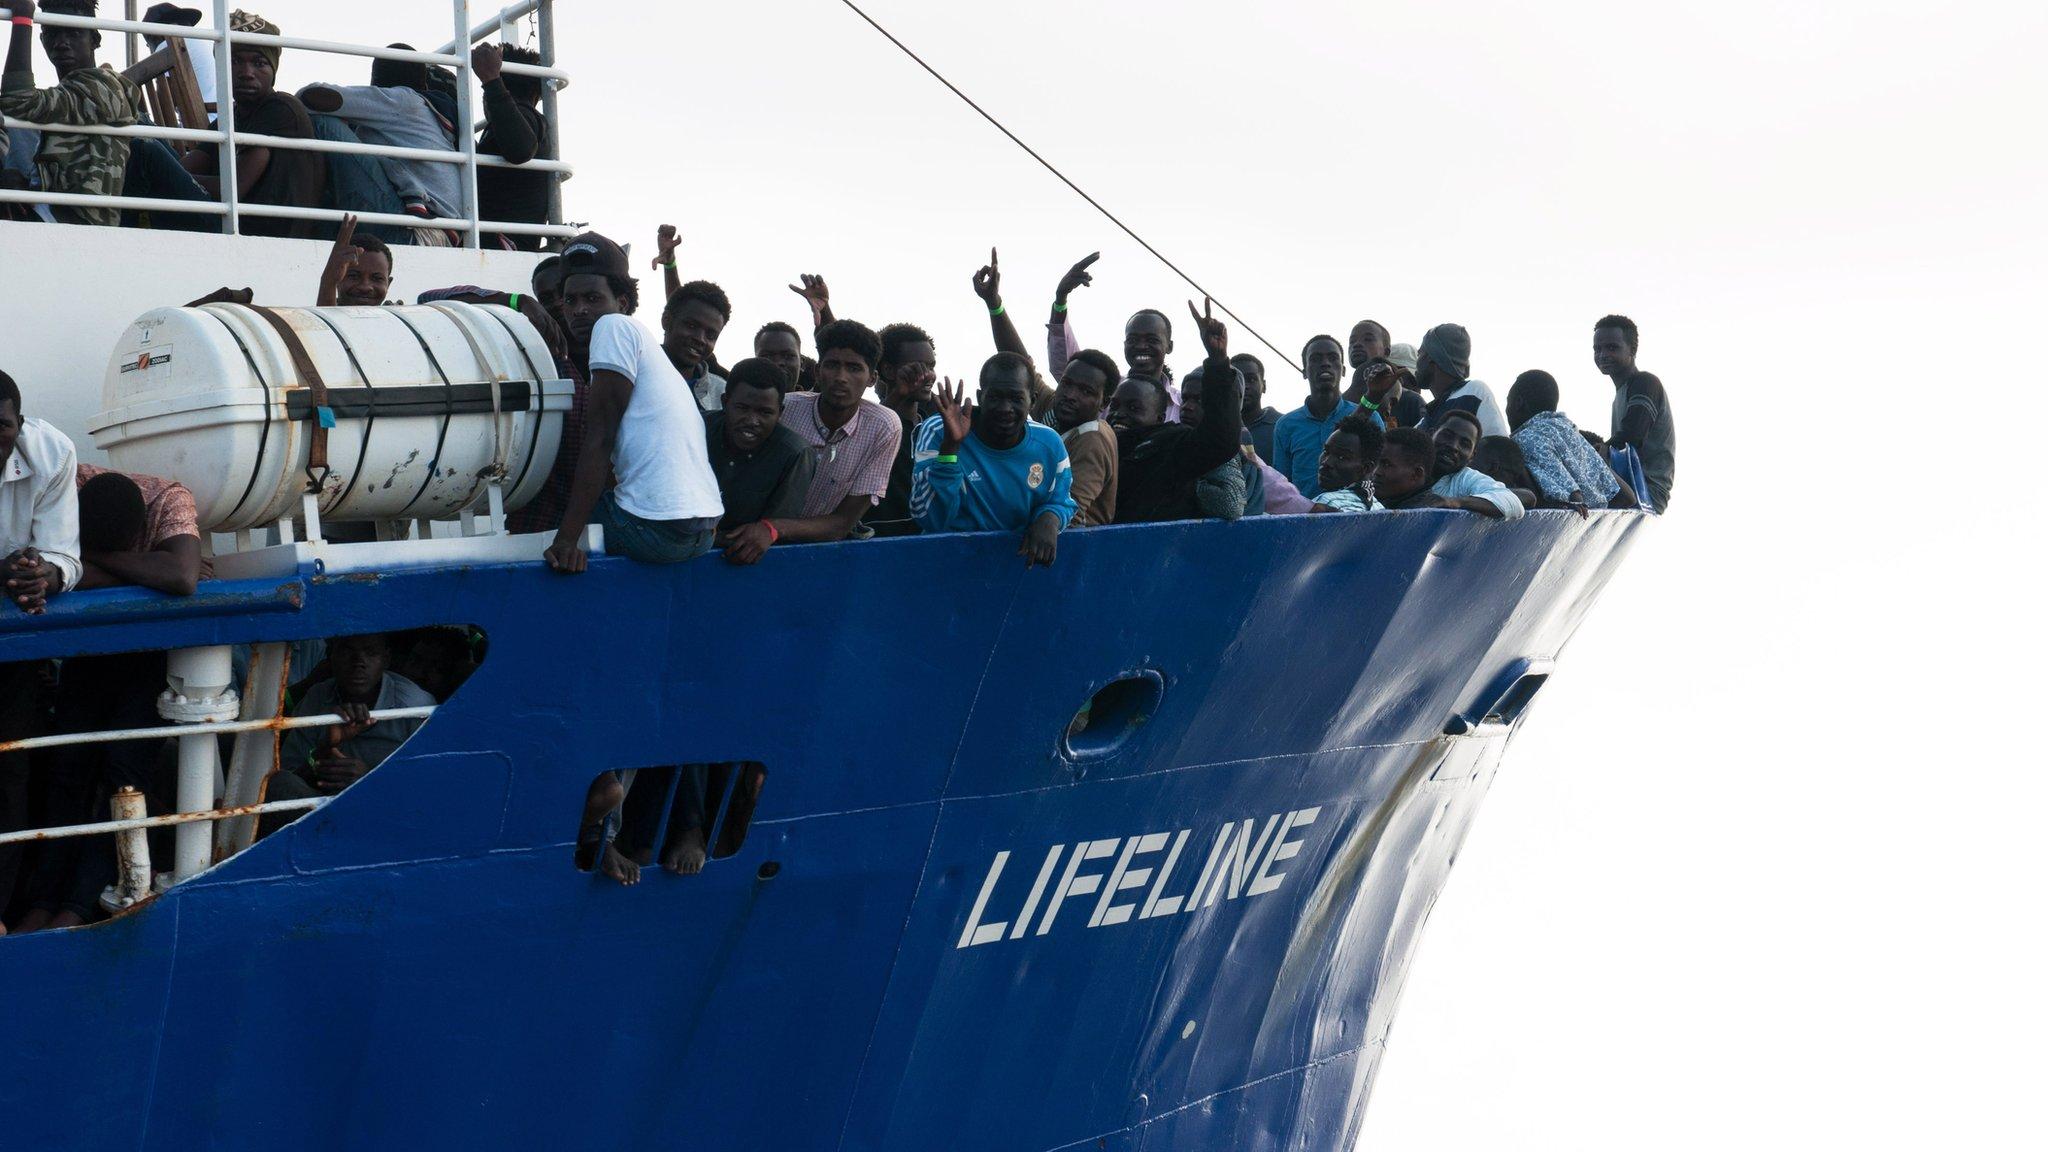 Italy migrant row: 'Inhumane' Malta refuses rescue ship